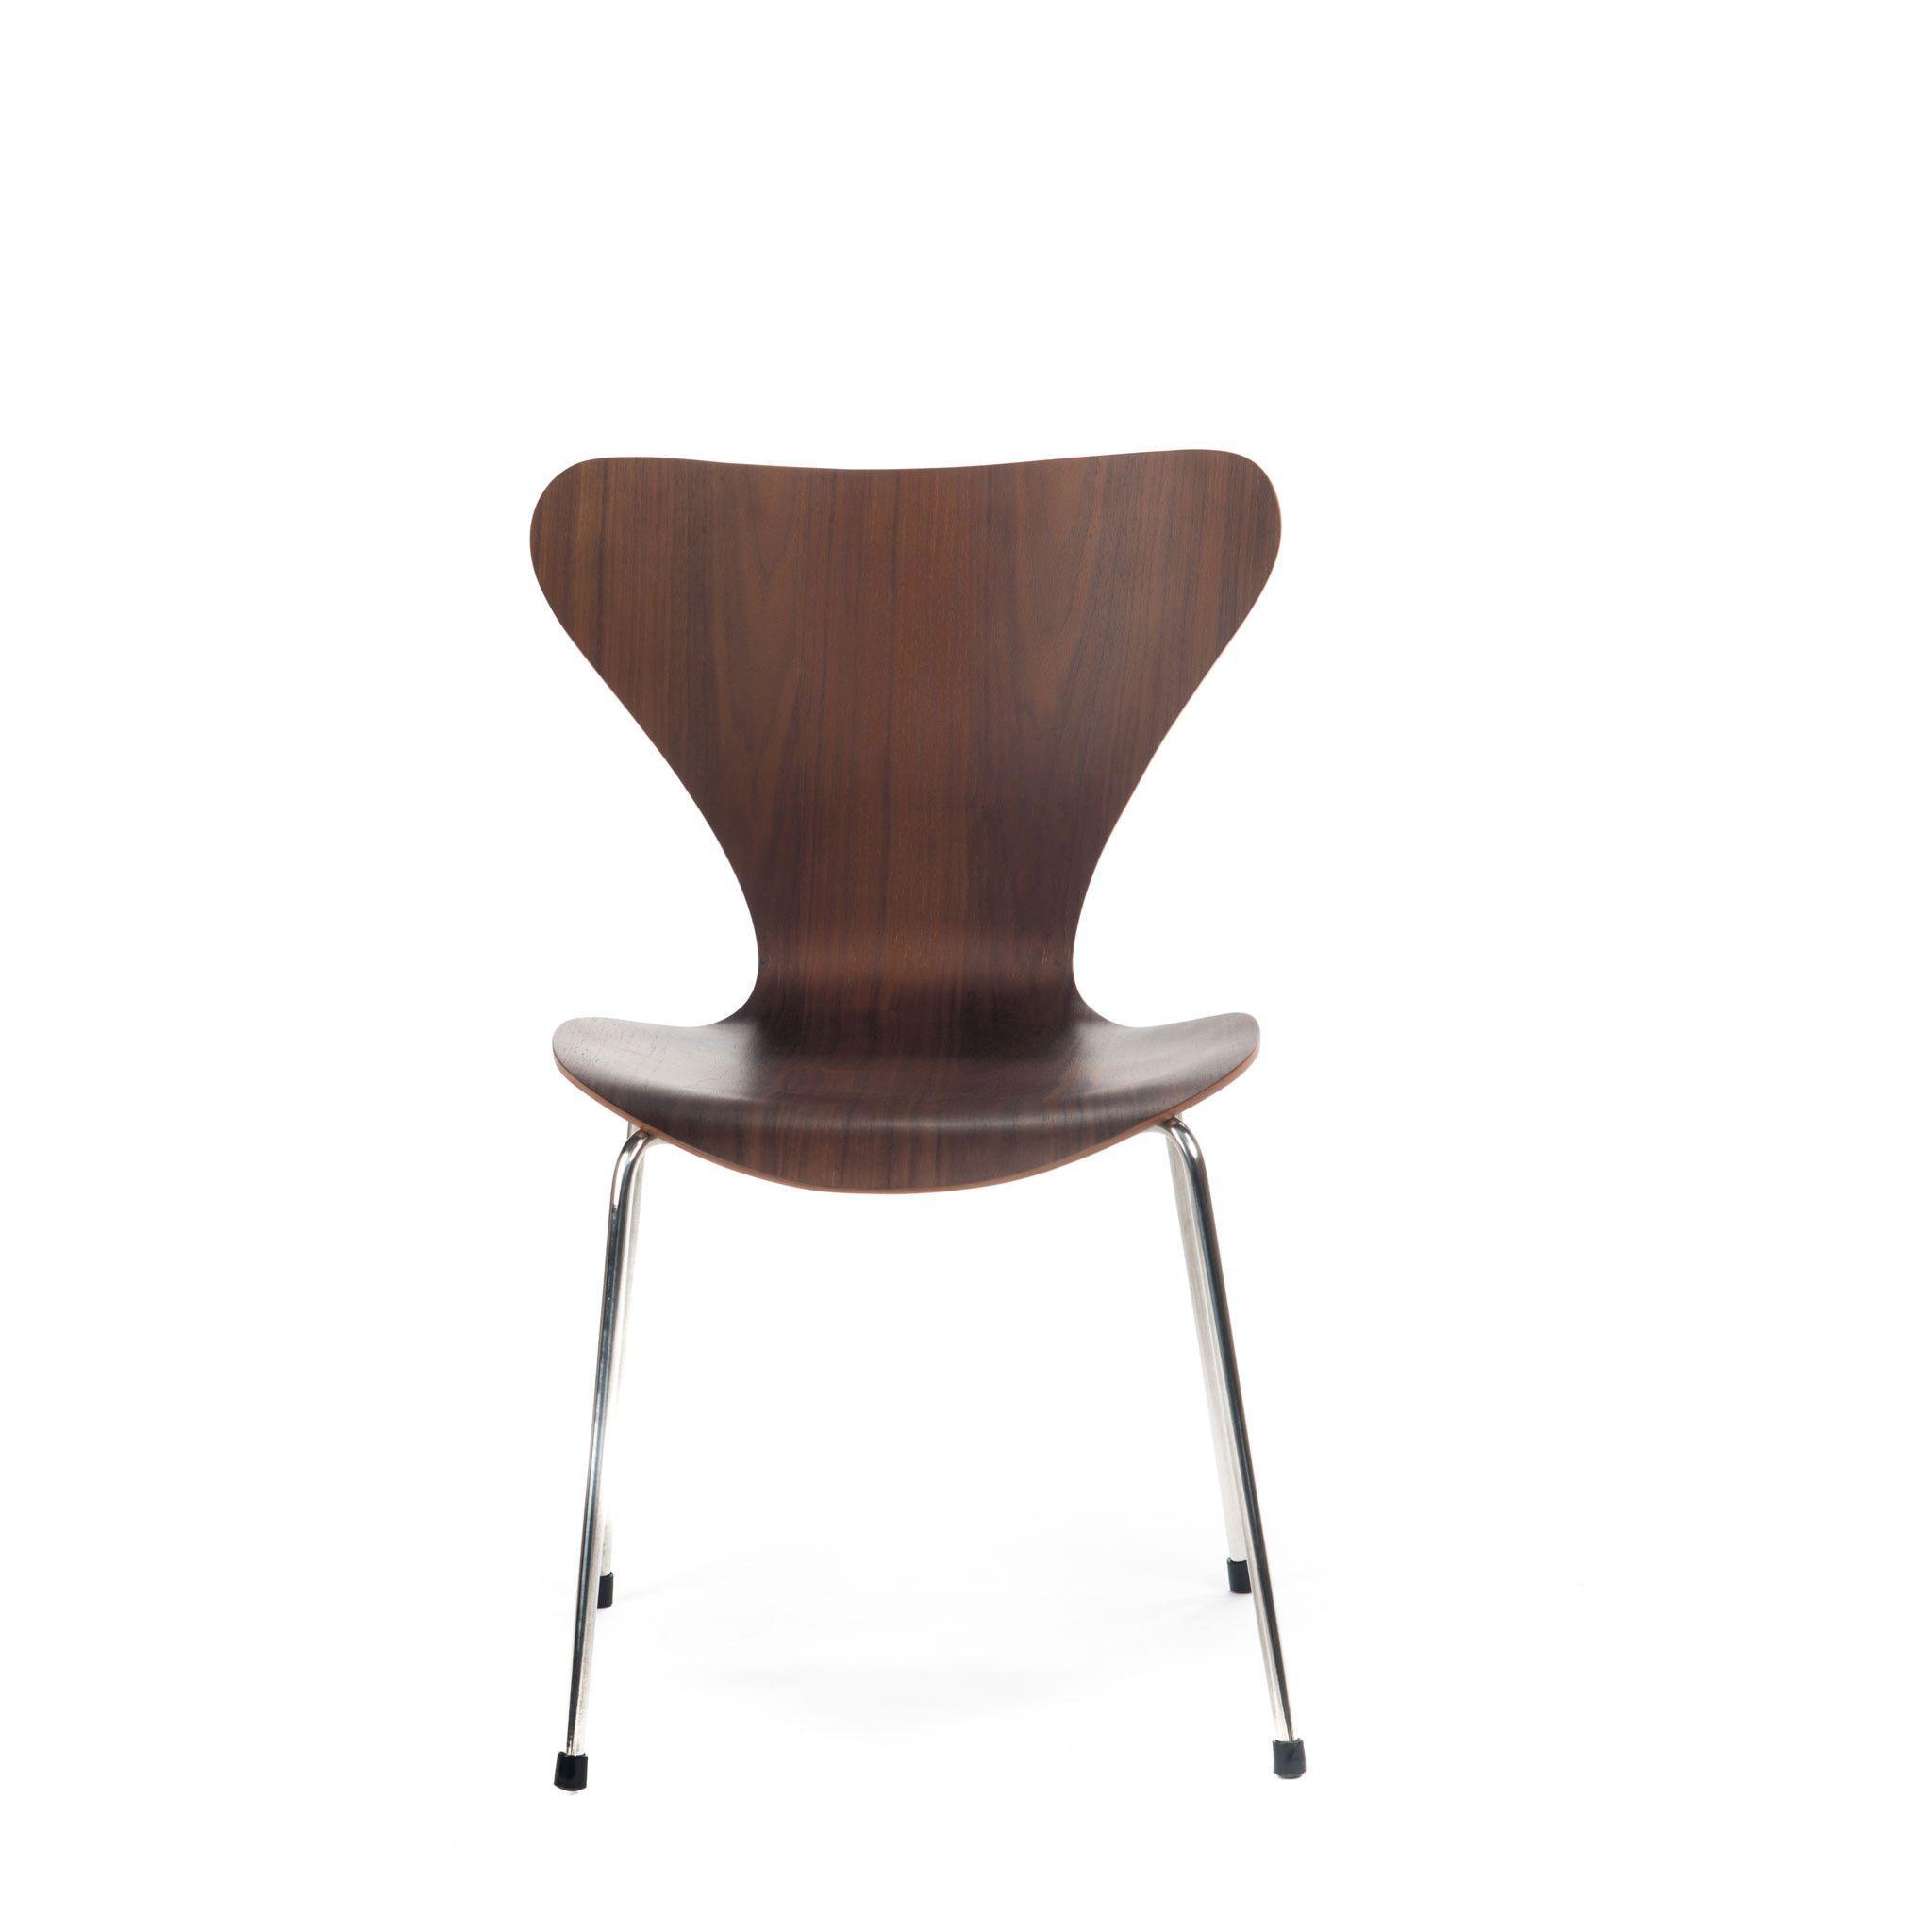 Sas Chair Wood Plywood Chair Chair Wood